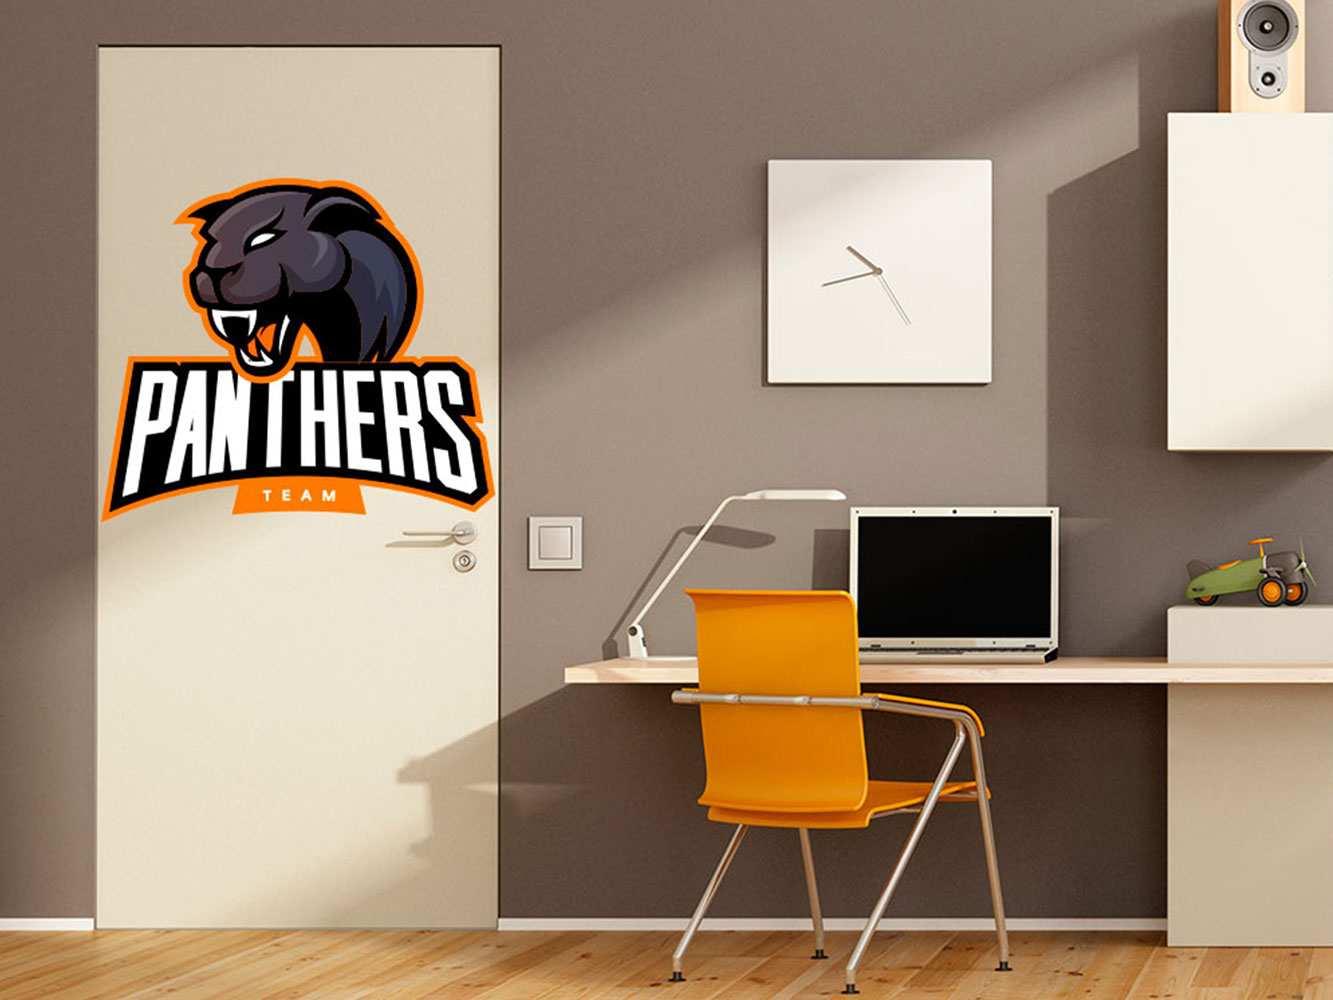 Vinilo Decorativo Puerta Panthers Team | Carteles XXL - Impresión carteleria publicitaria